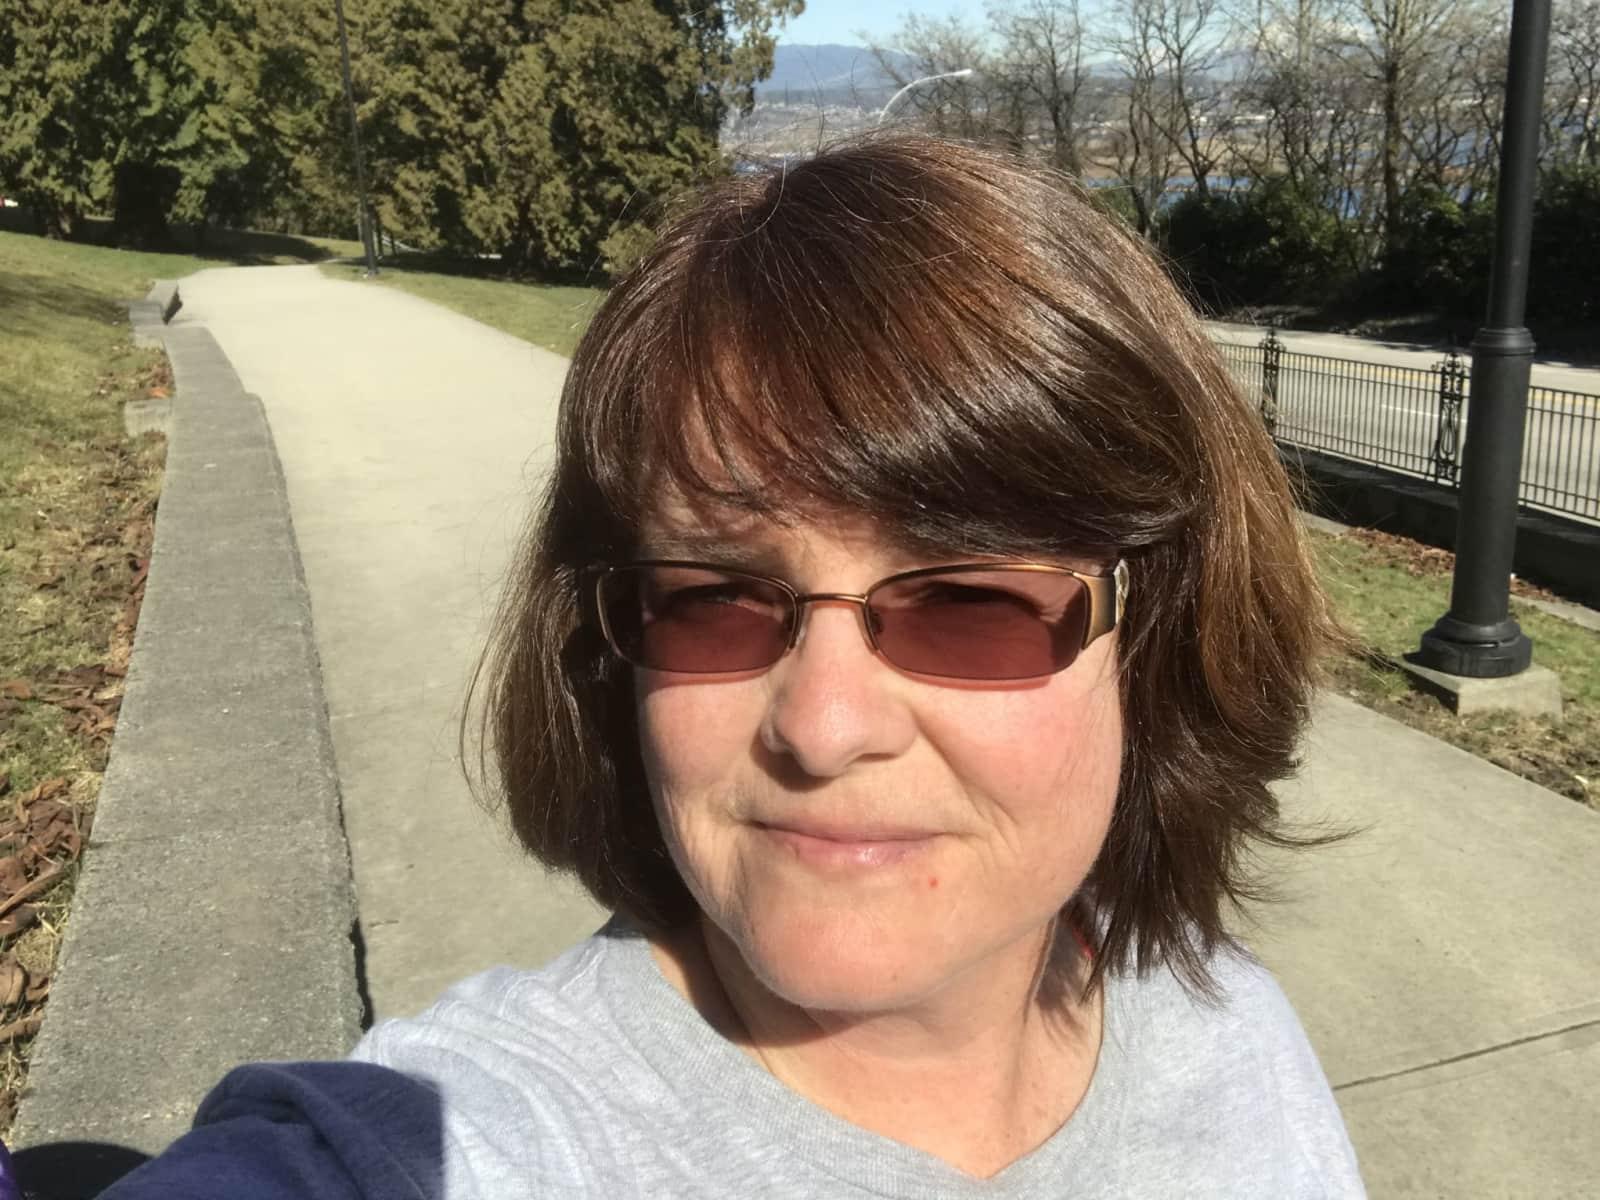 Jennifer from Wingham, Ontario, Canada